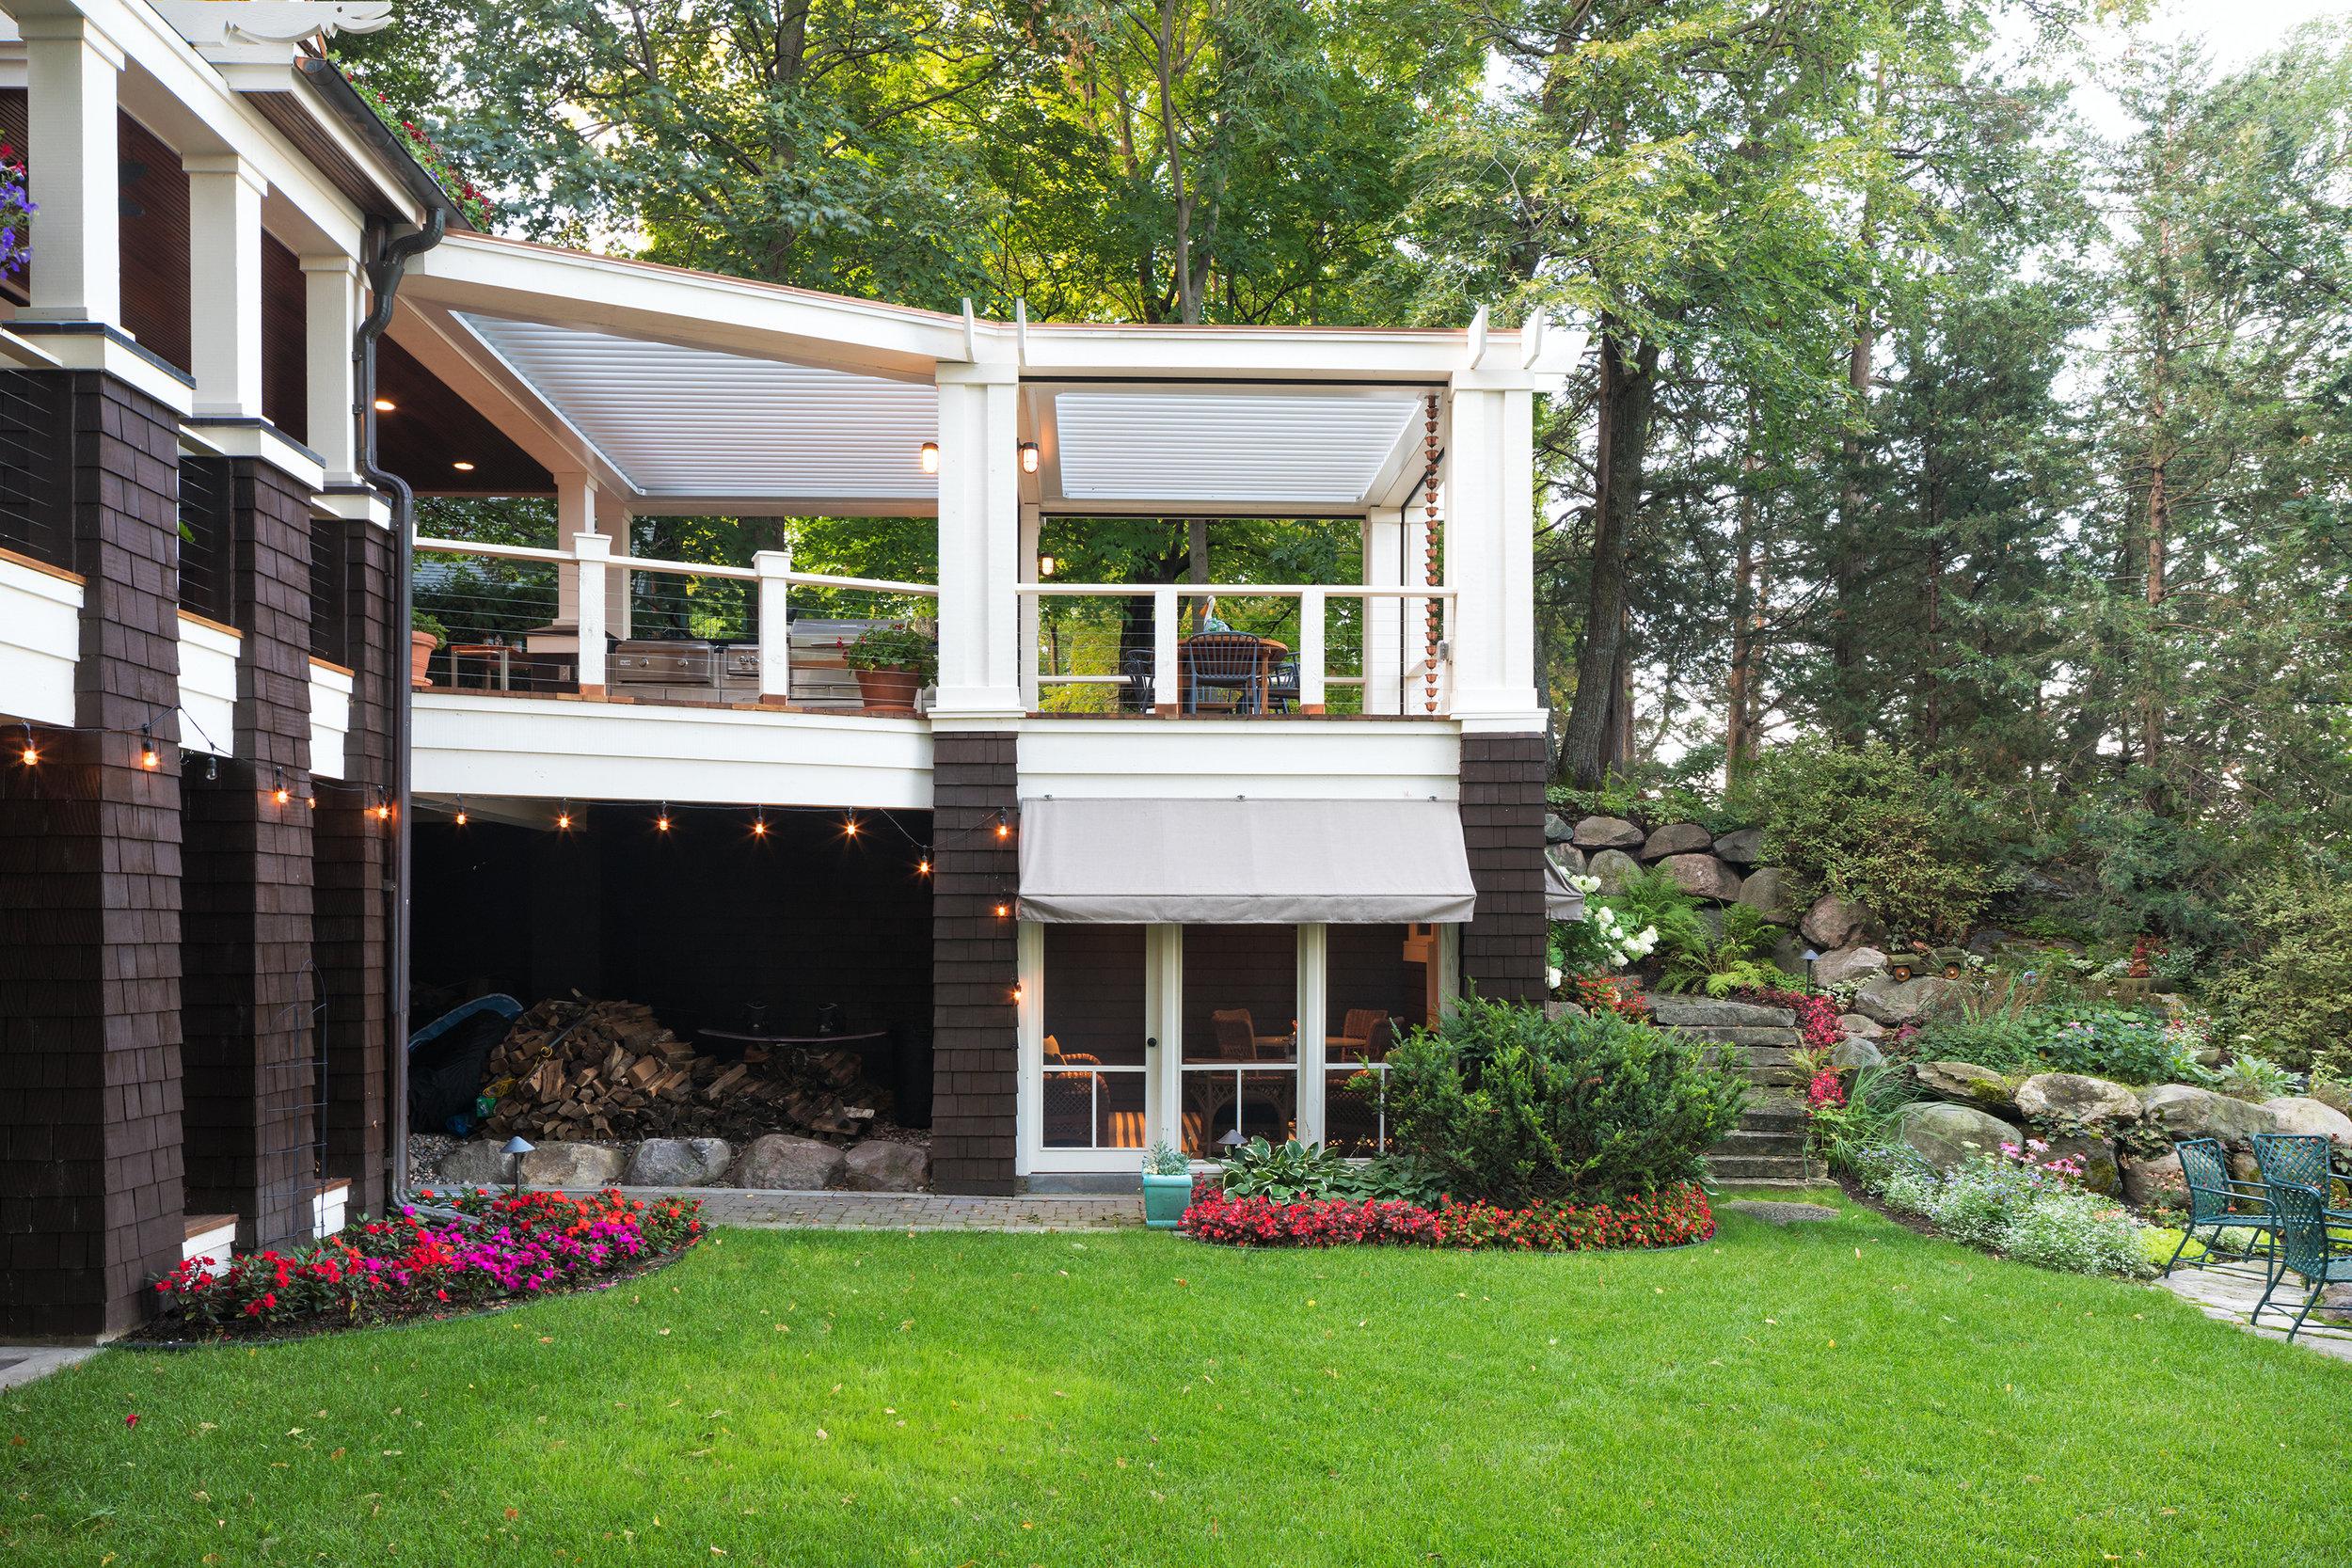 Mom's Design Build - Backyard Automated Aluminum Pergola System Deck